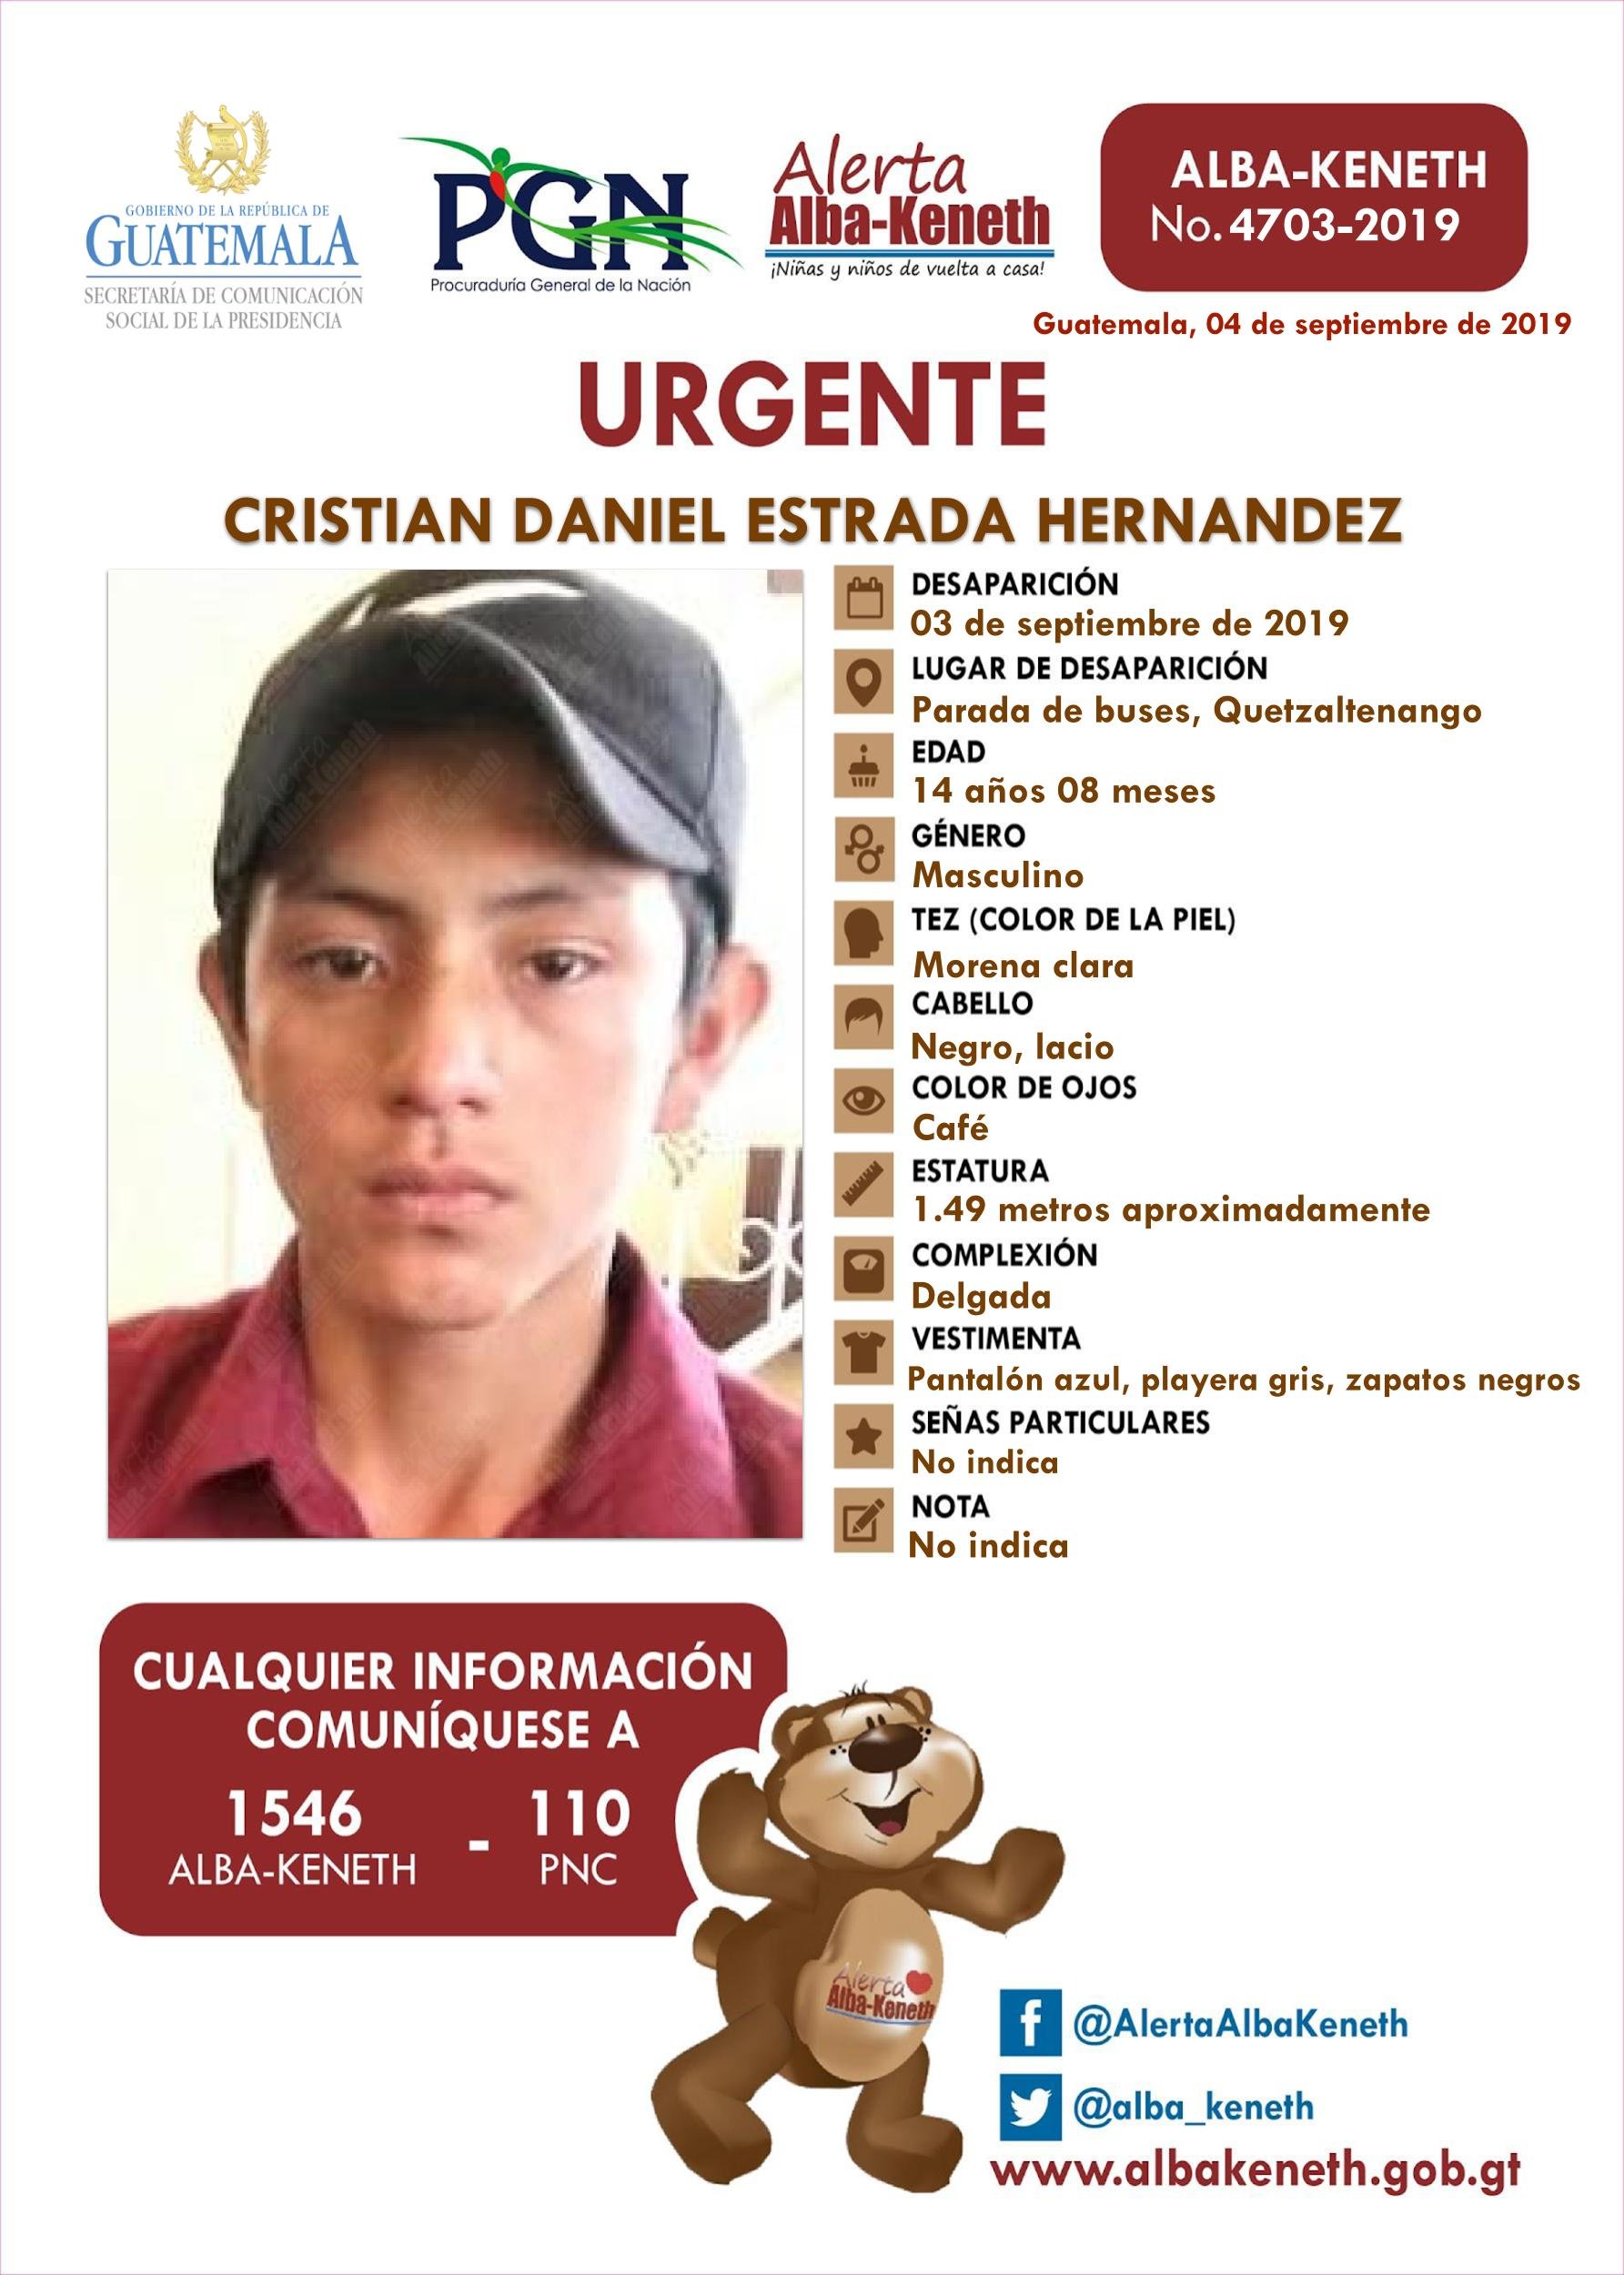 Cristian Daniel Estrada Hernandez